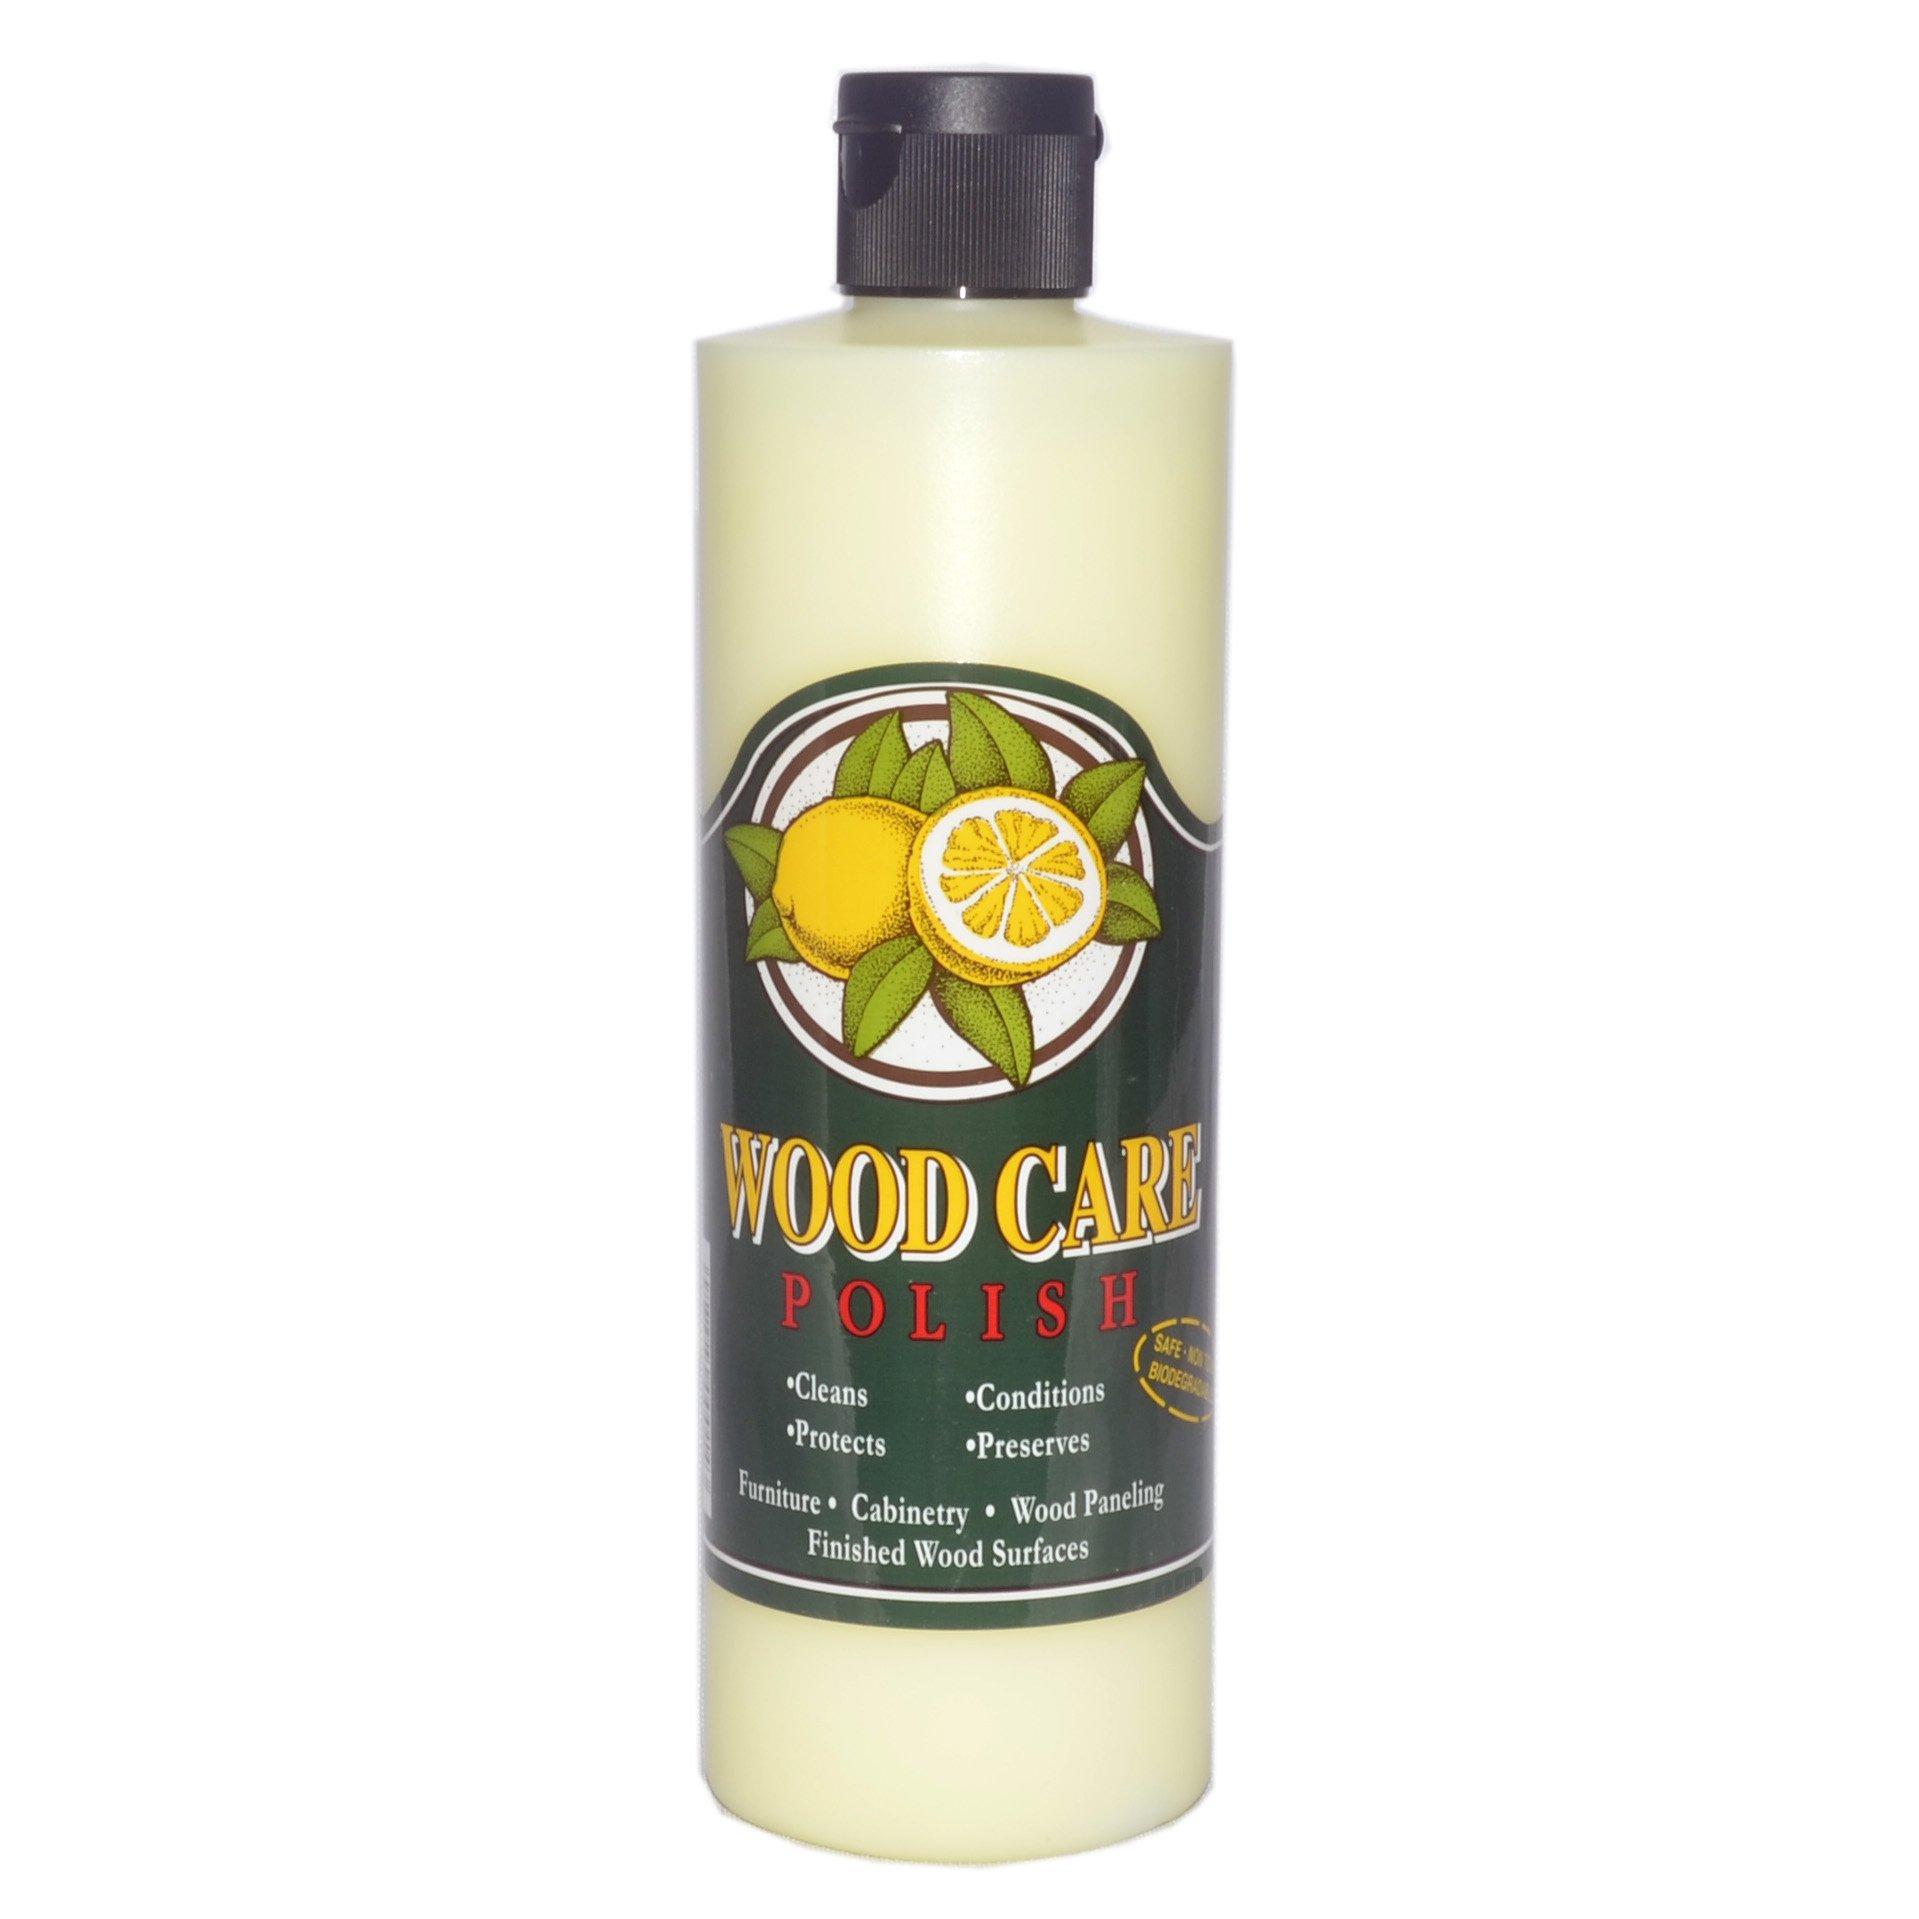 Wood Care Polish 12 fl oz